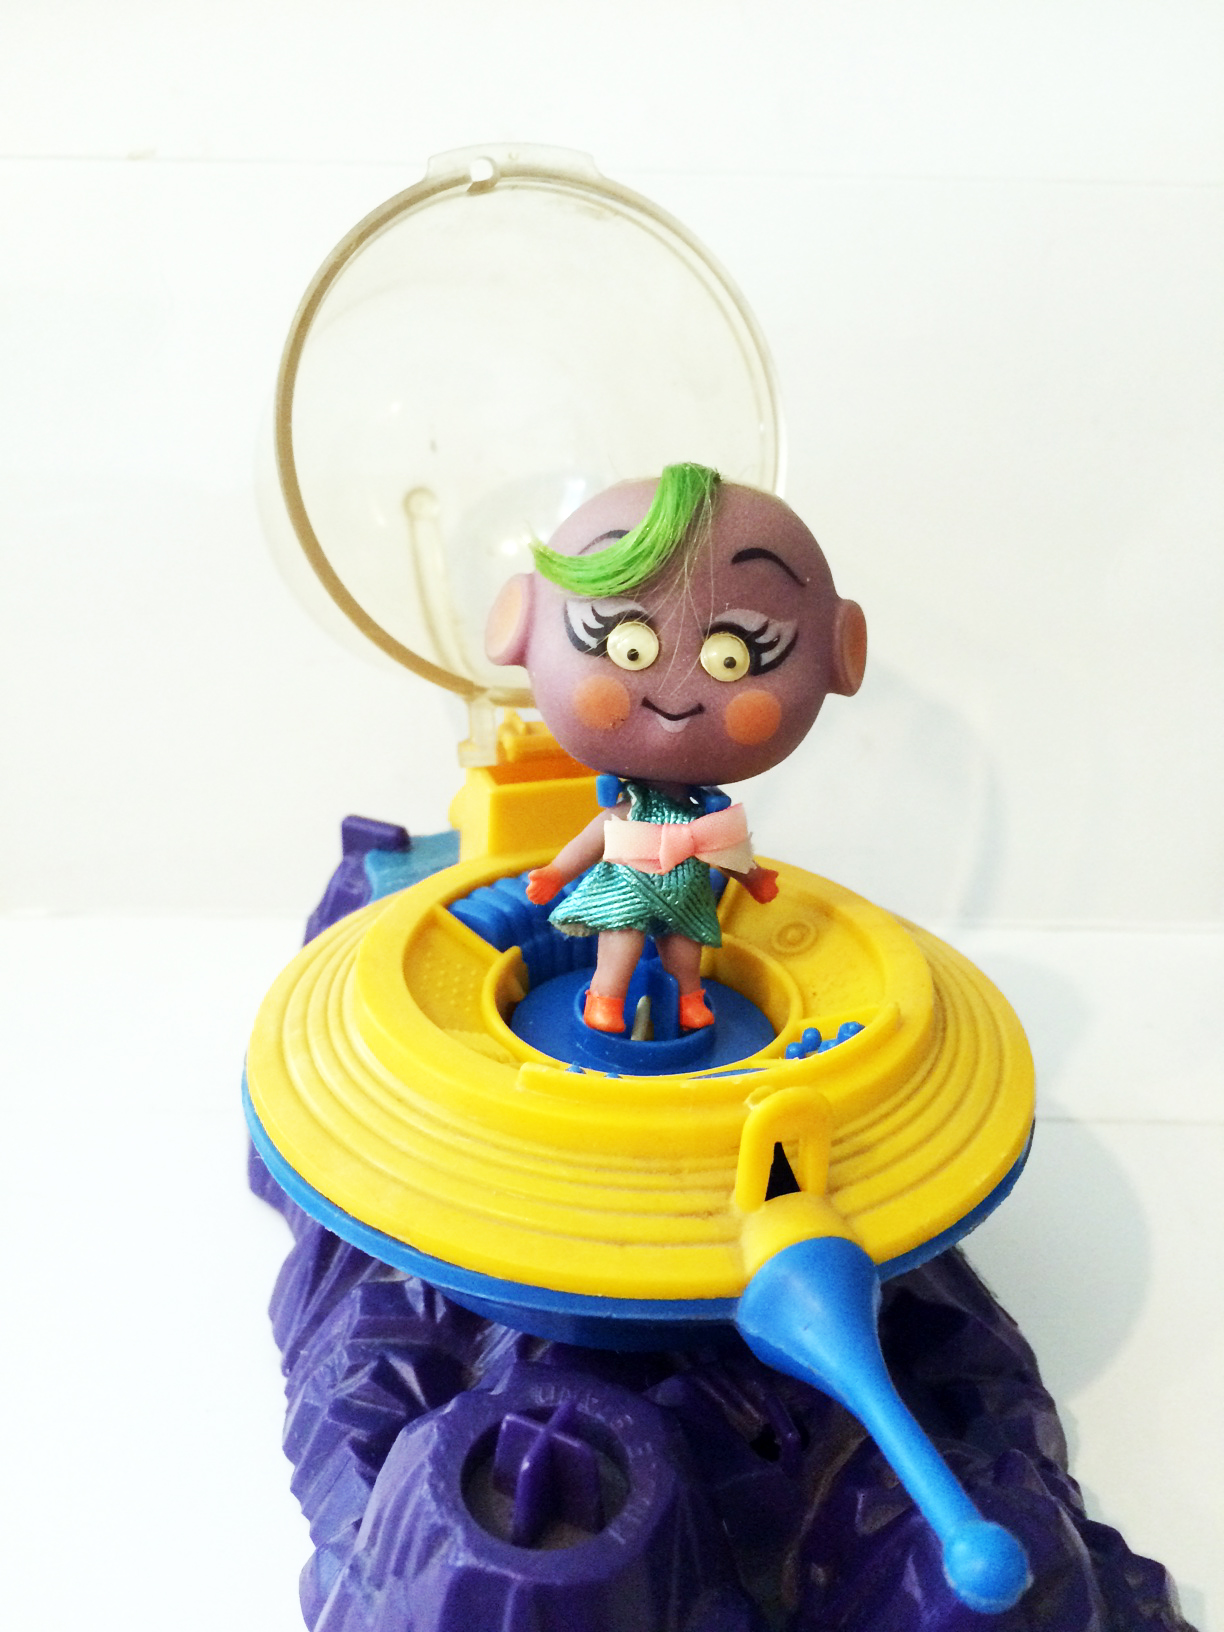 Mattel Kozmic Kiddles Purple Gurple